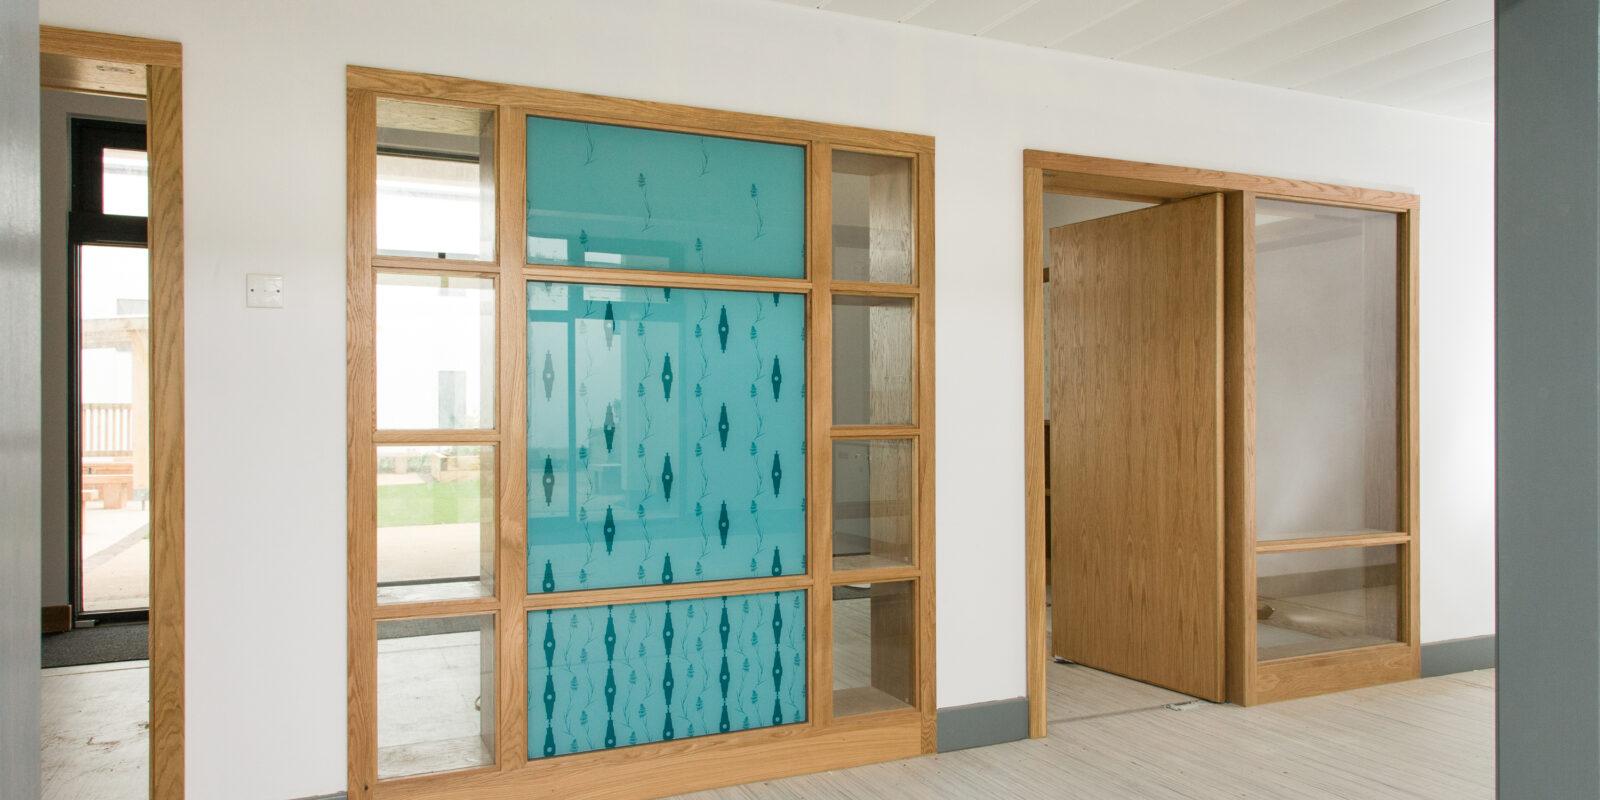 Ryhope Secure Unit Furniture